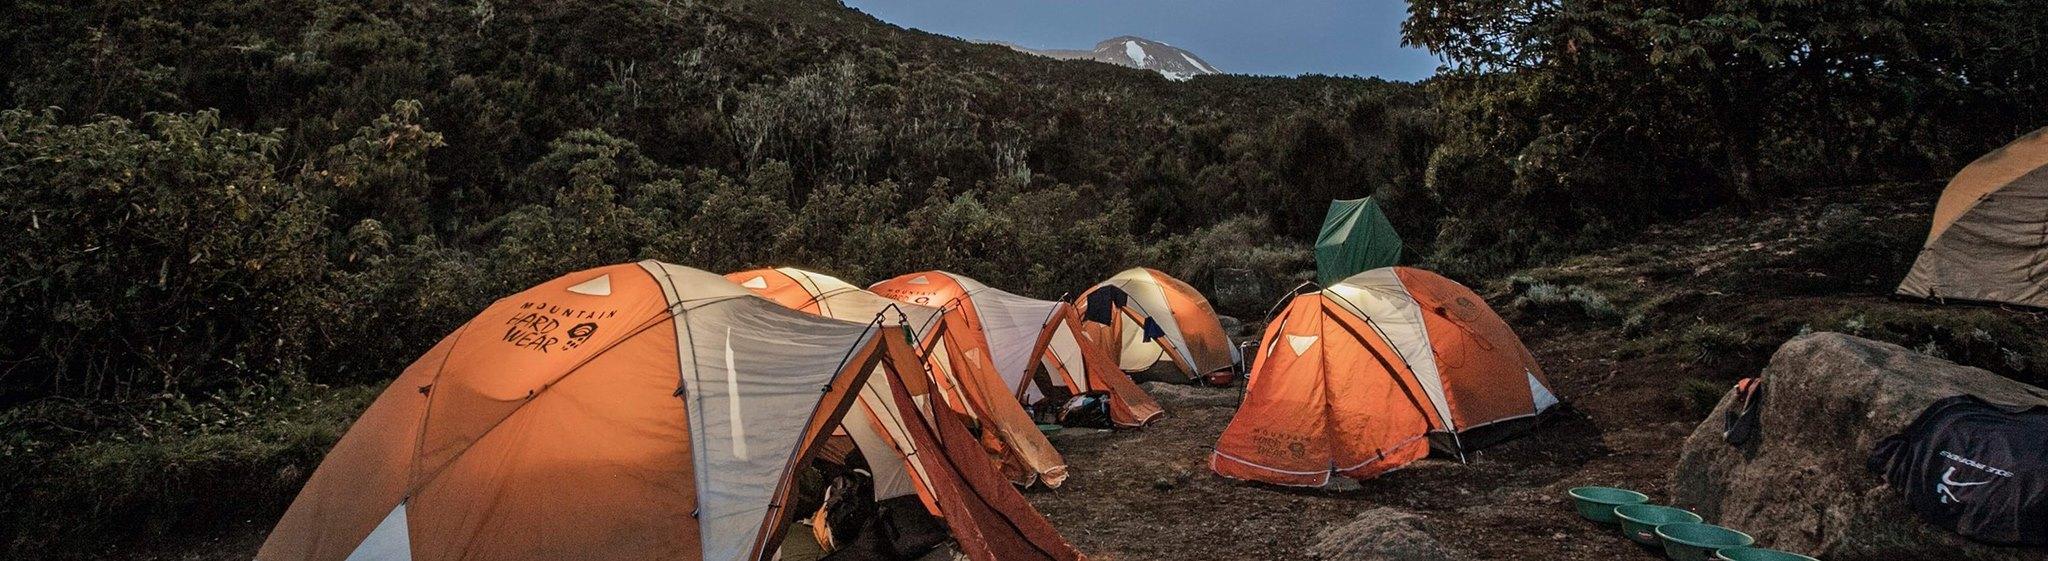 Kilimanjaro + Zanzibar via Marangu Route - Safanta Tours & Travel Company Limited